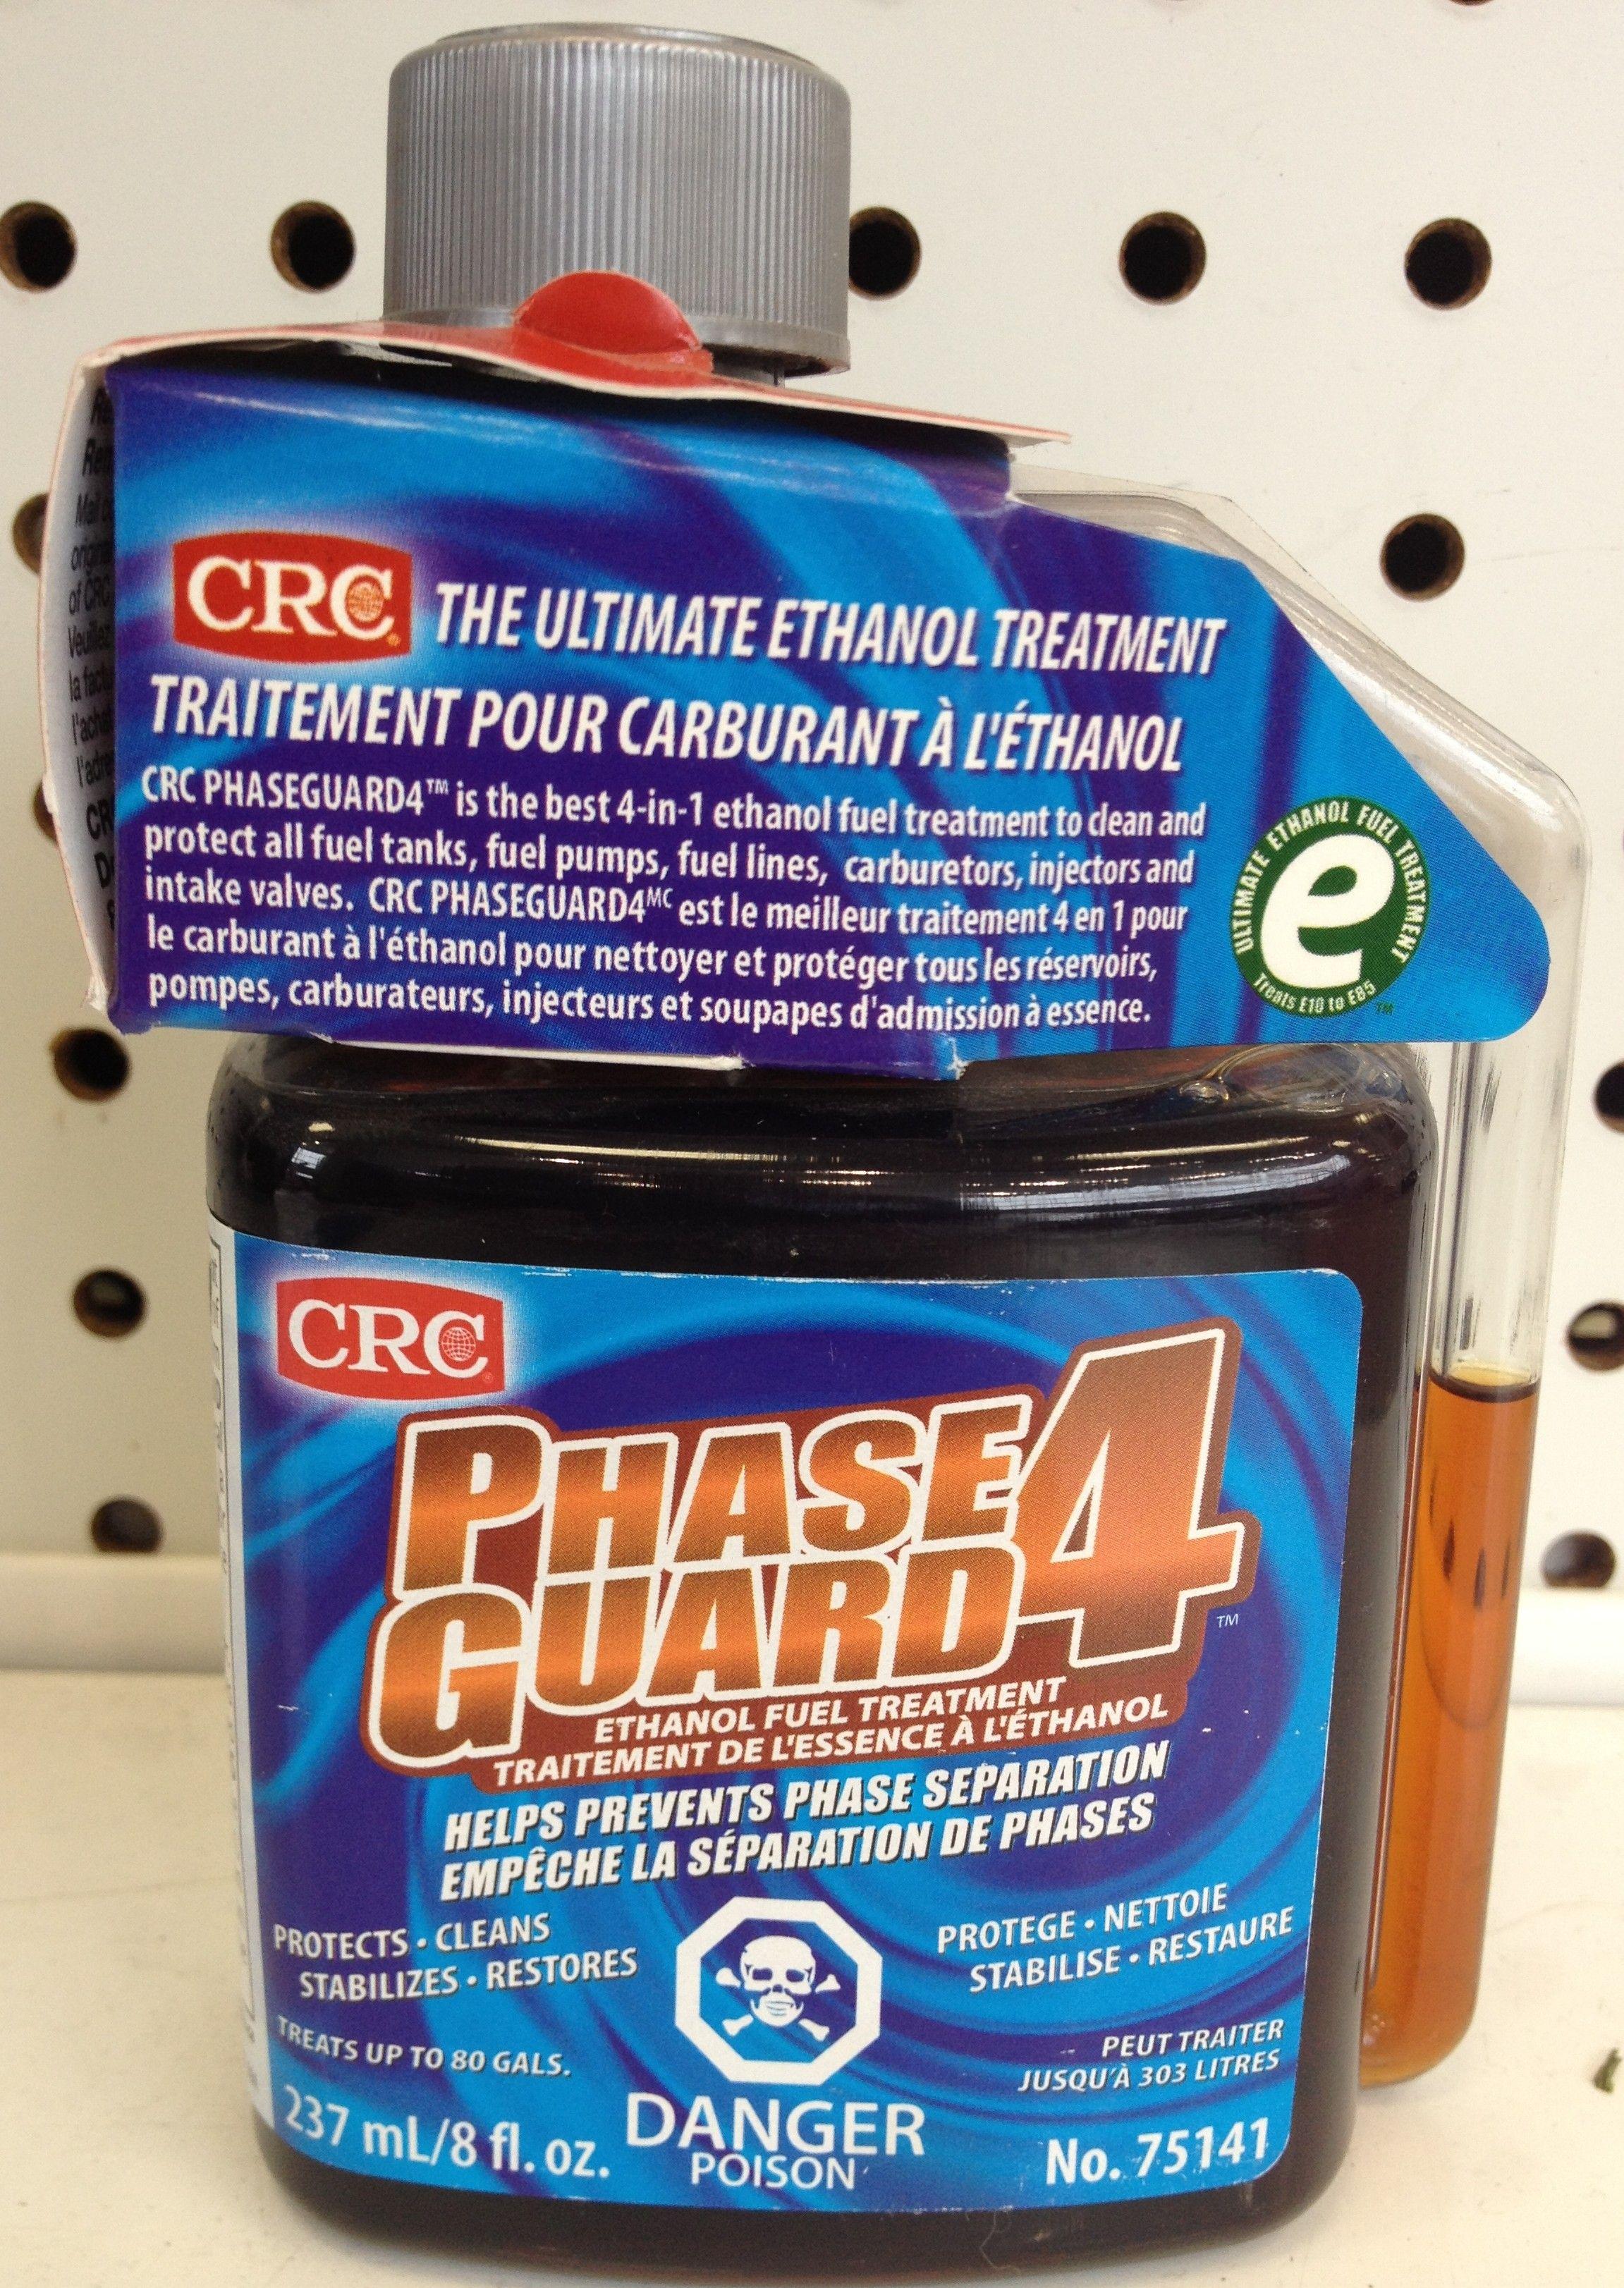 Phase Guard 4 Ethanol Fuel Treatment 237mL bottle